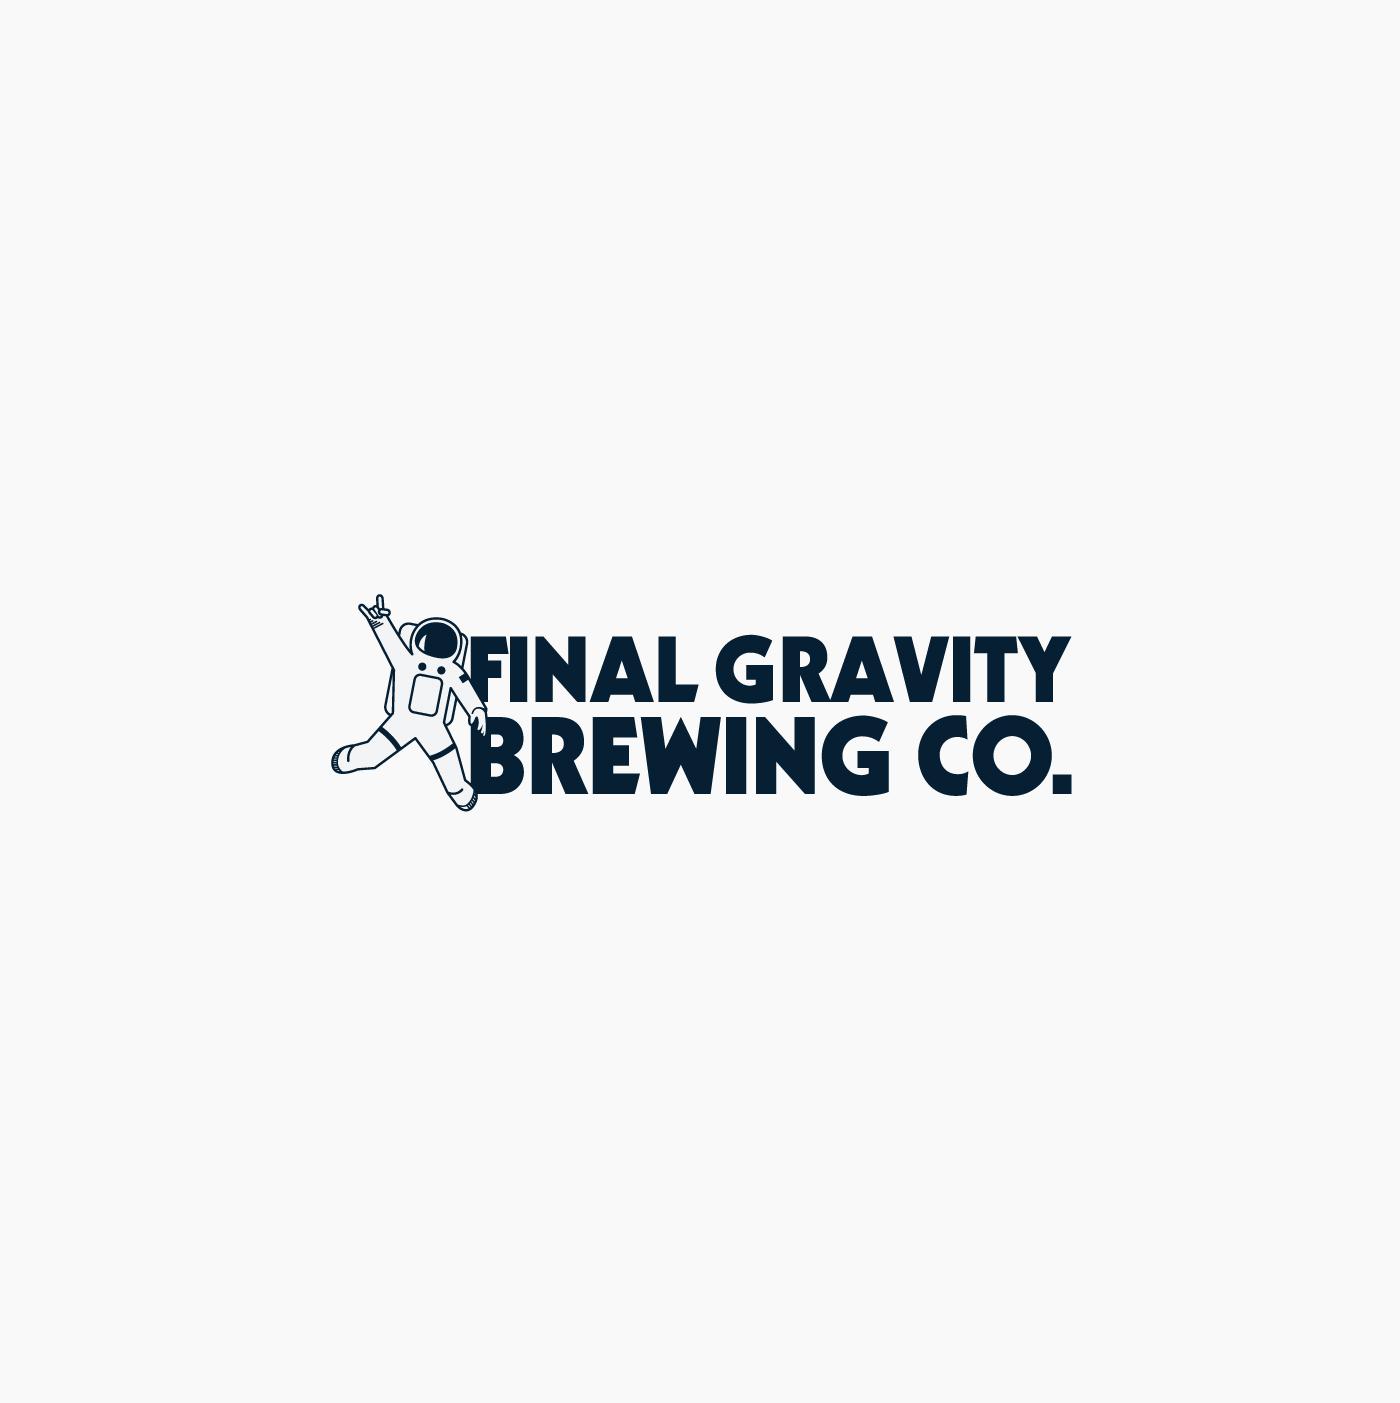 MQ31-finalgravitybrewing.jpg